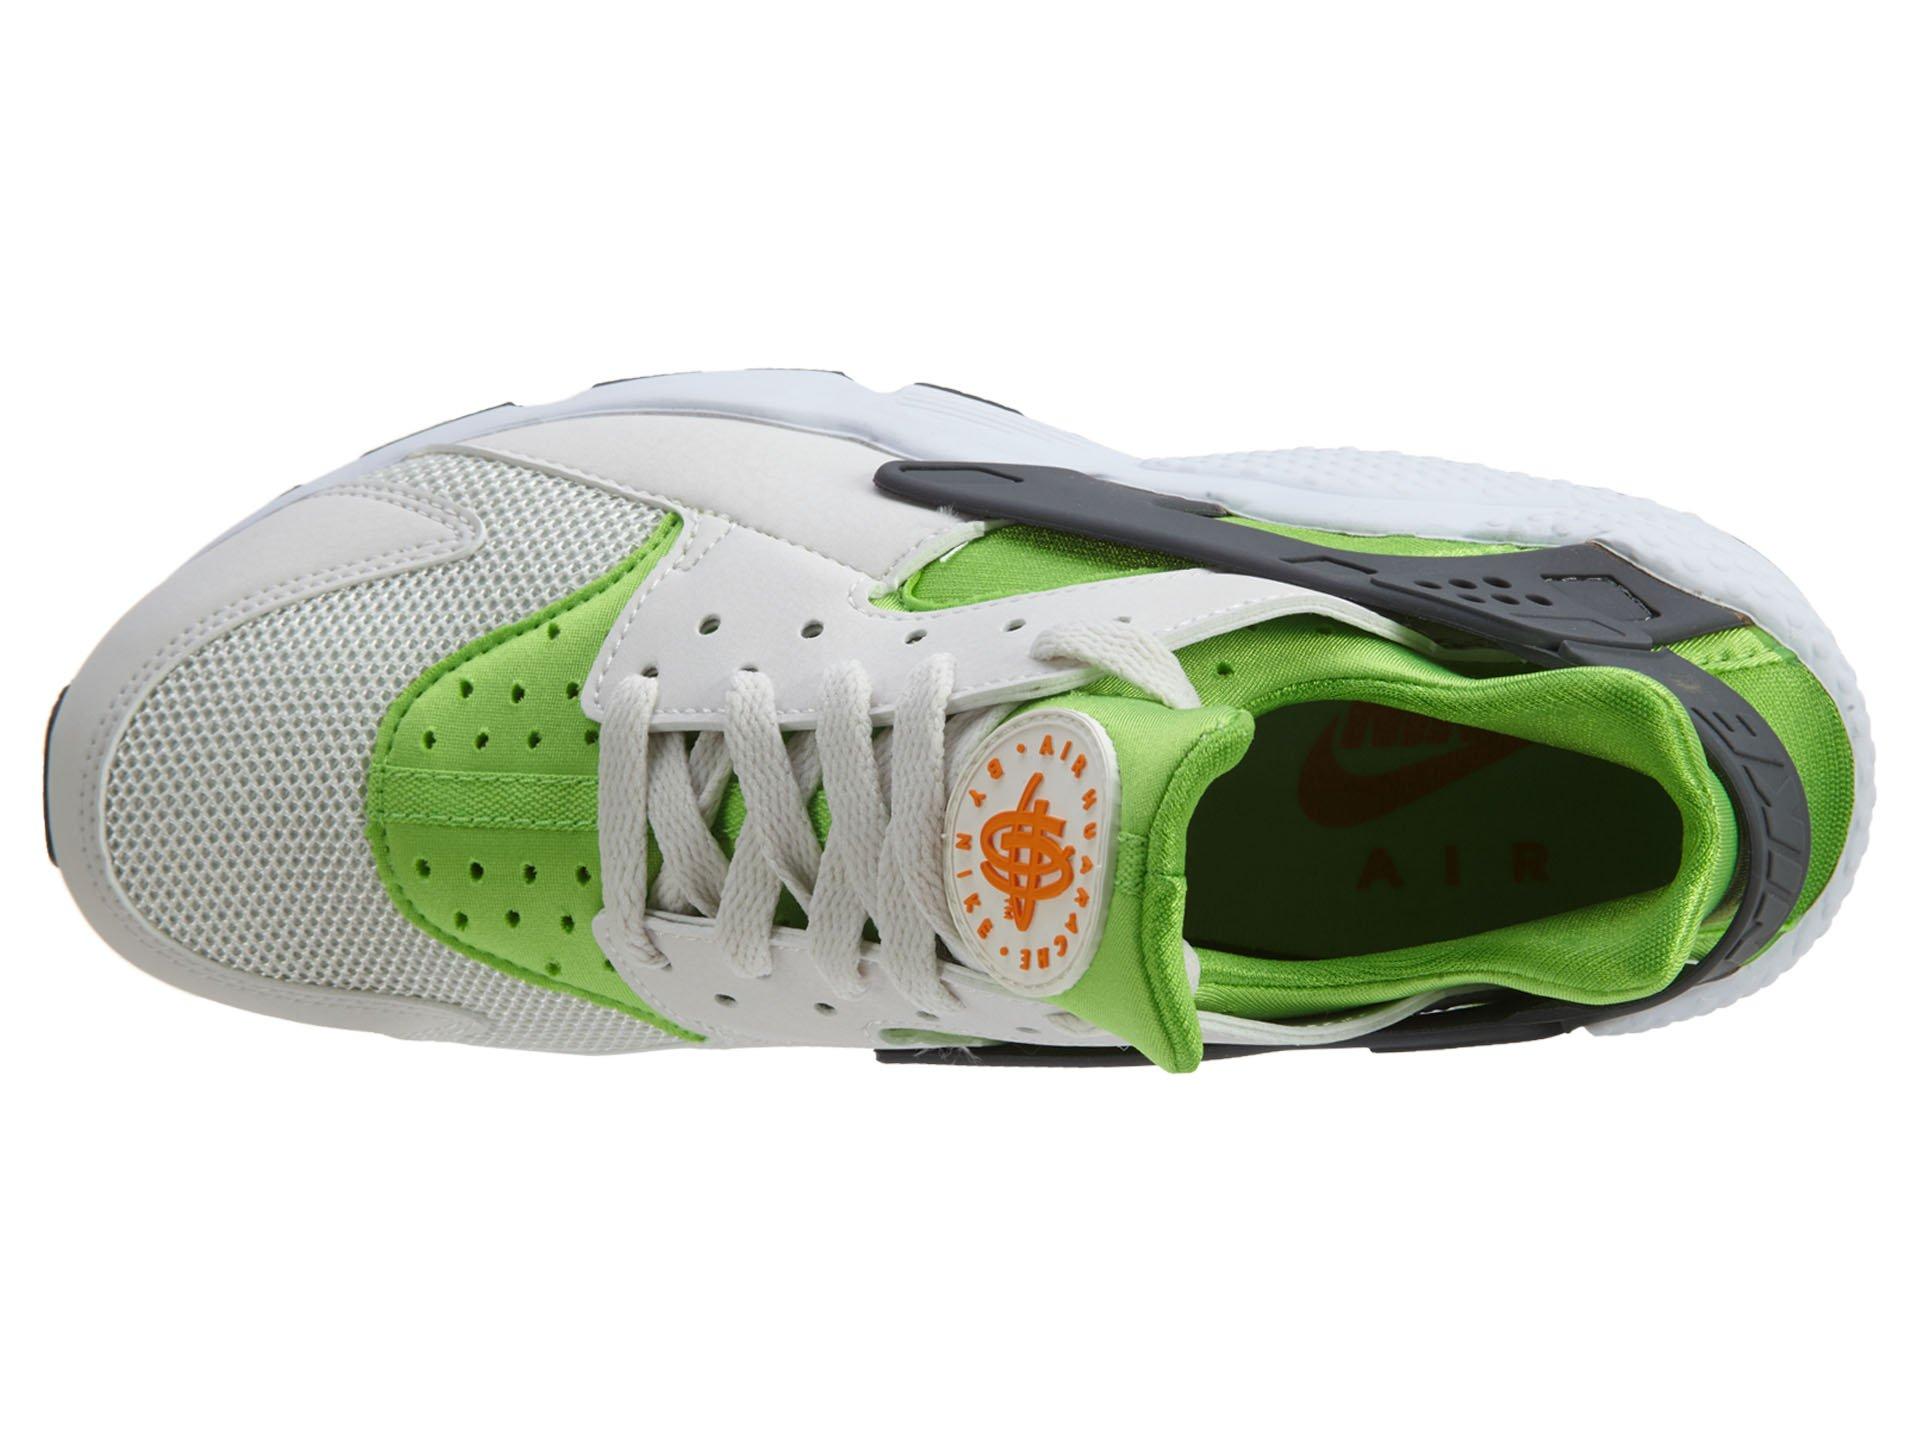 Nike Men's Air Huarache Actn Green/Vvd Orng Phntm Wht Running Shoe 10.5 Men US by NIKE (Image #6)